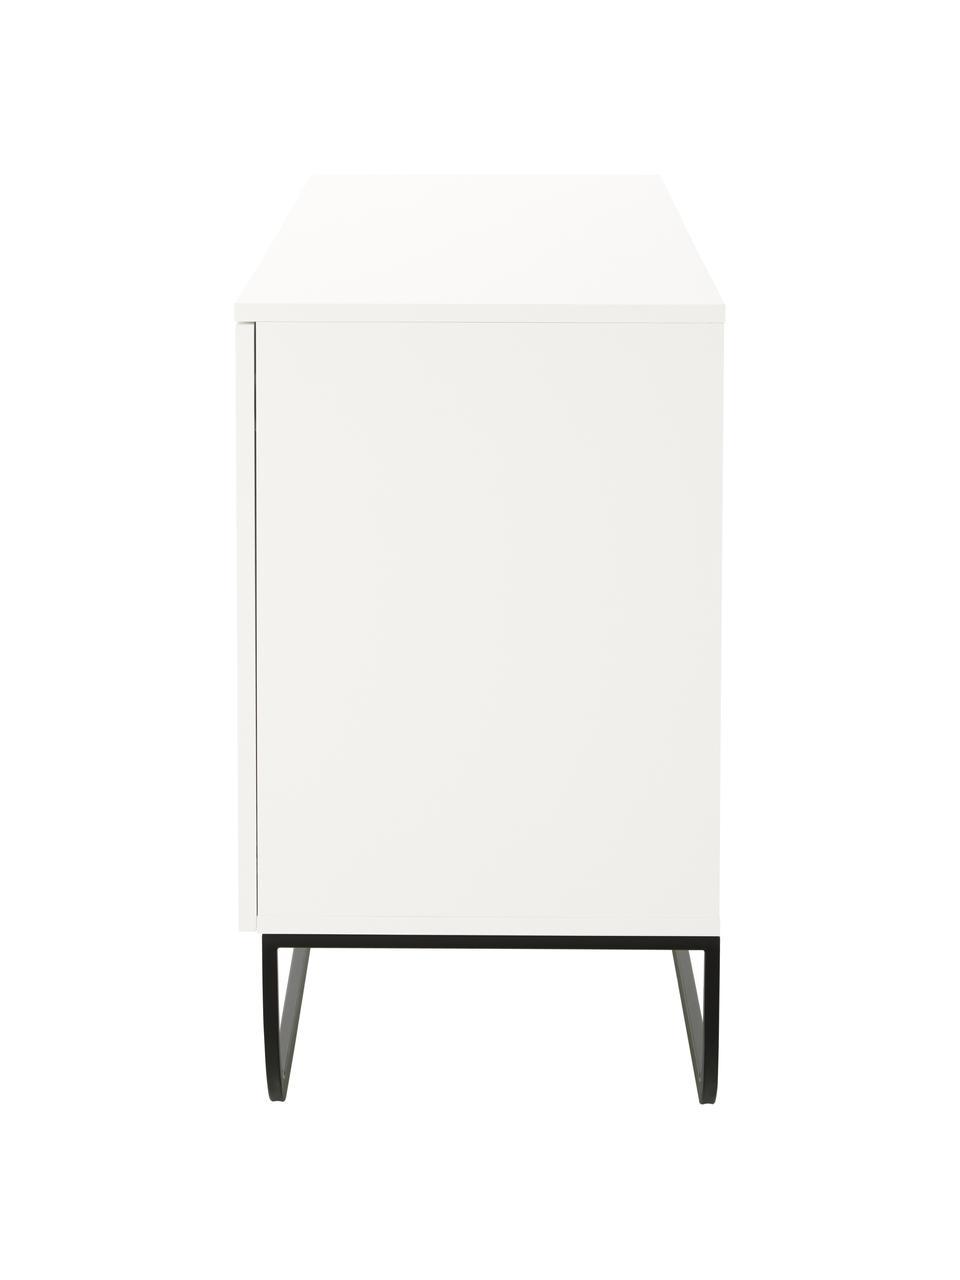 Klassiek dressoir Sanford met deuren in wit, Frame: gelakt MDF, Wit, 160 x 83 cm